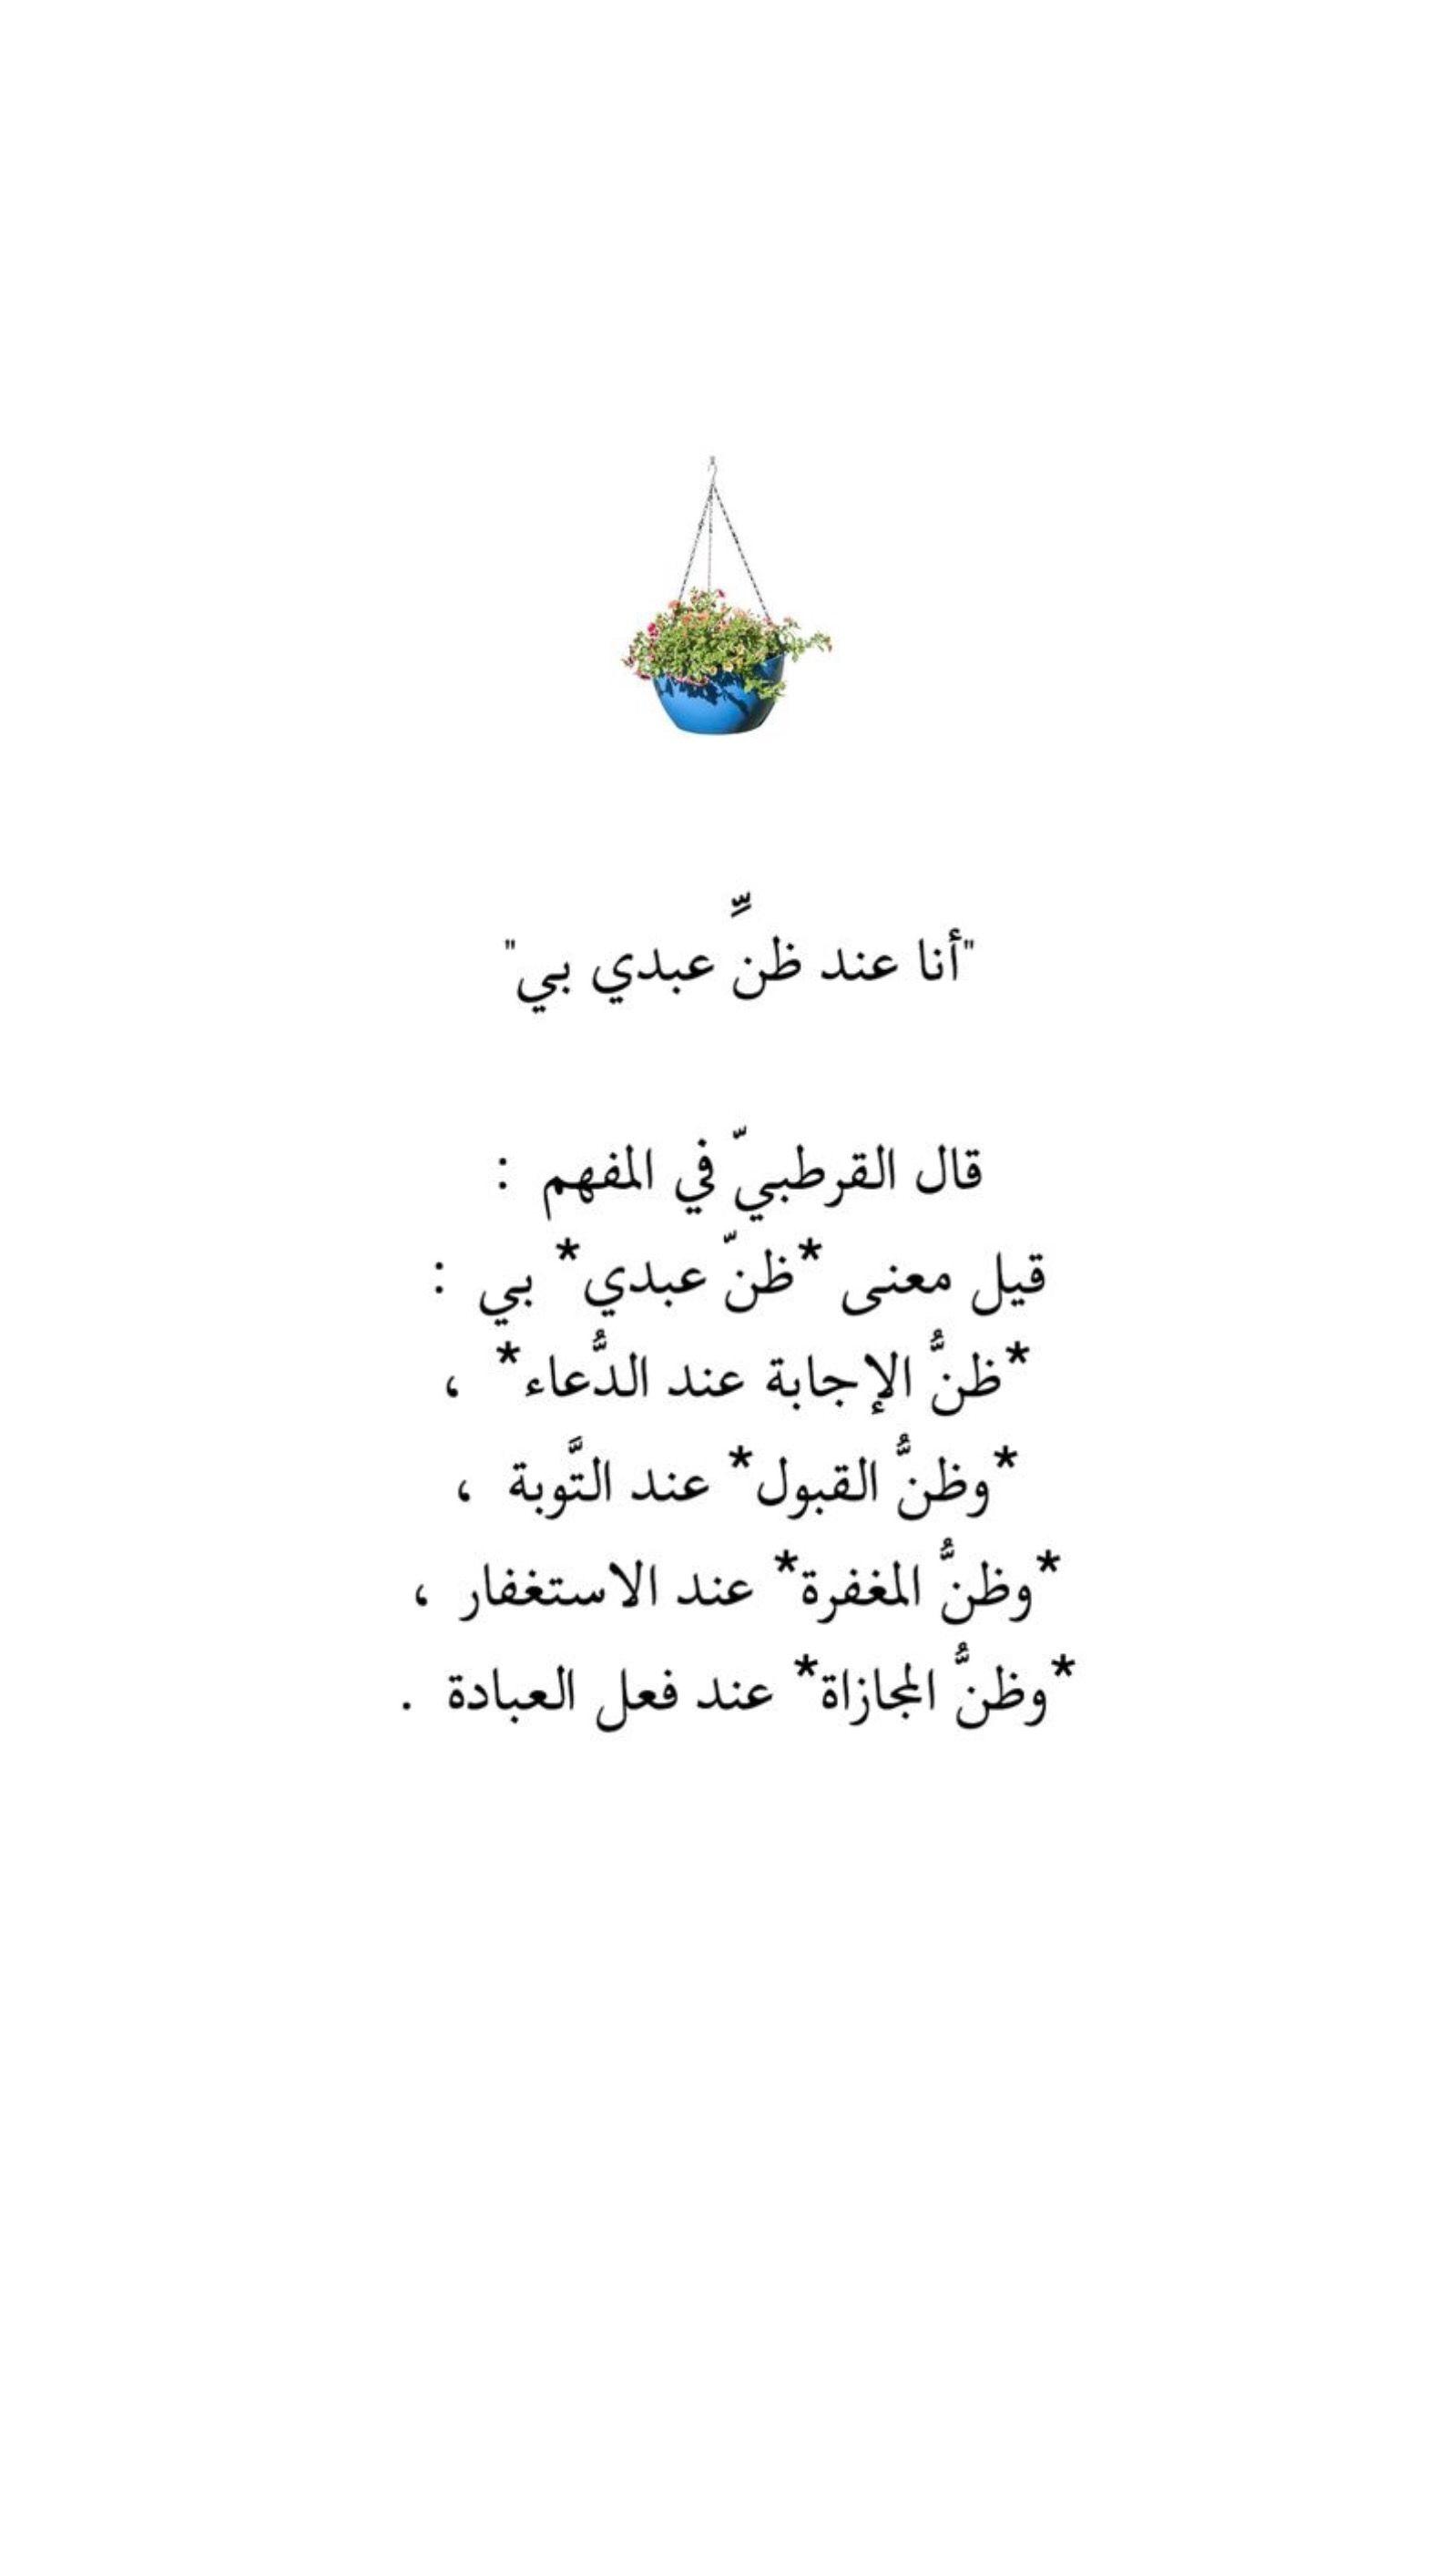 انا عند ظن عبدي بي Islamic Phrases Words Quotes Inspirational Words